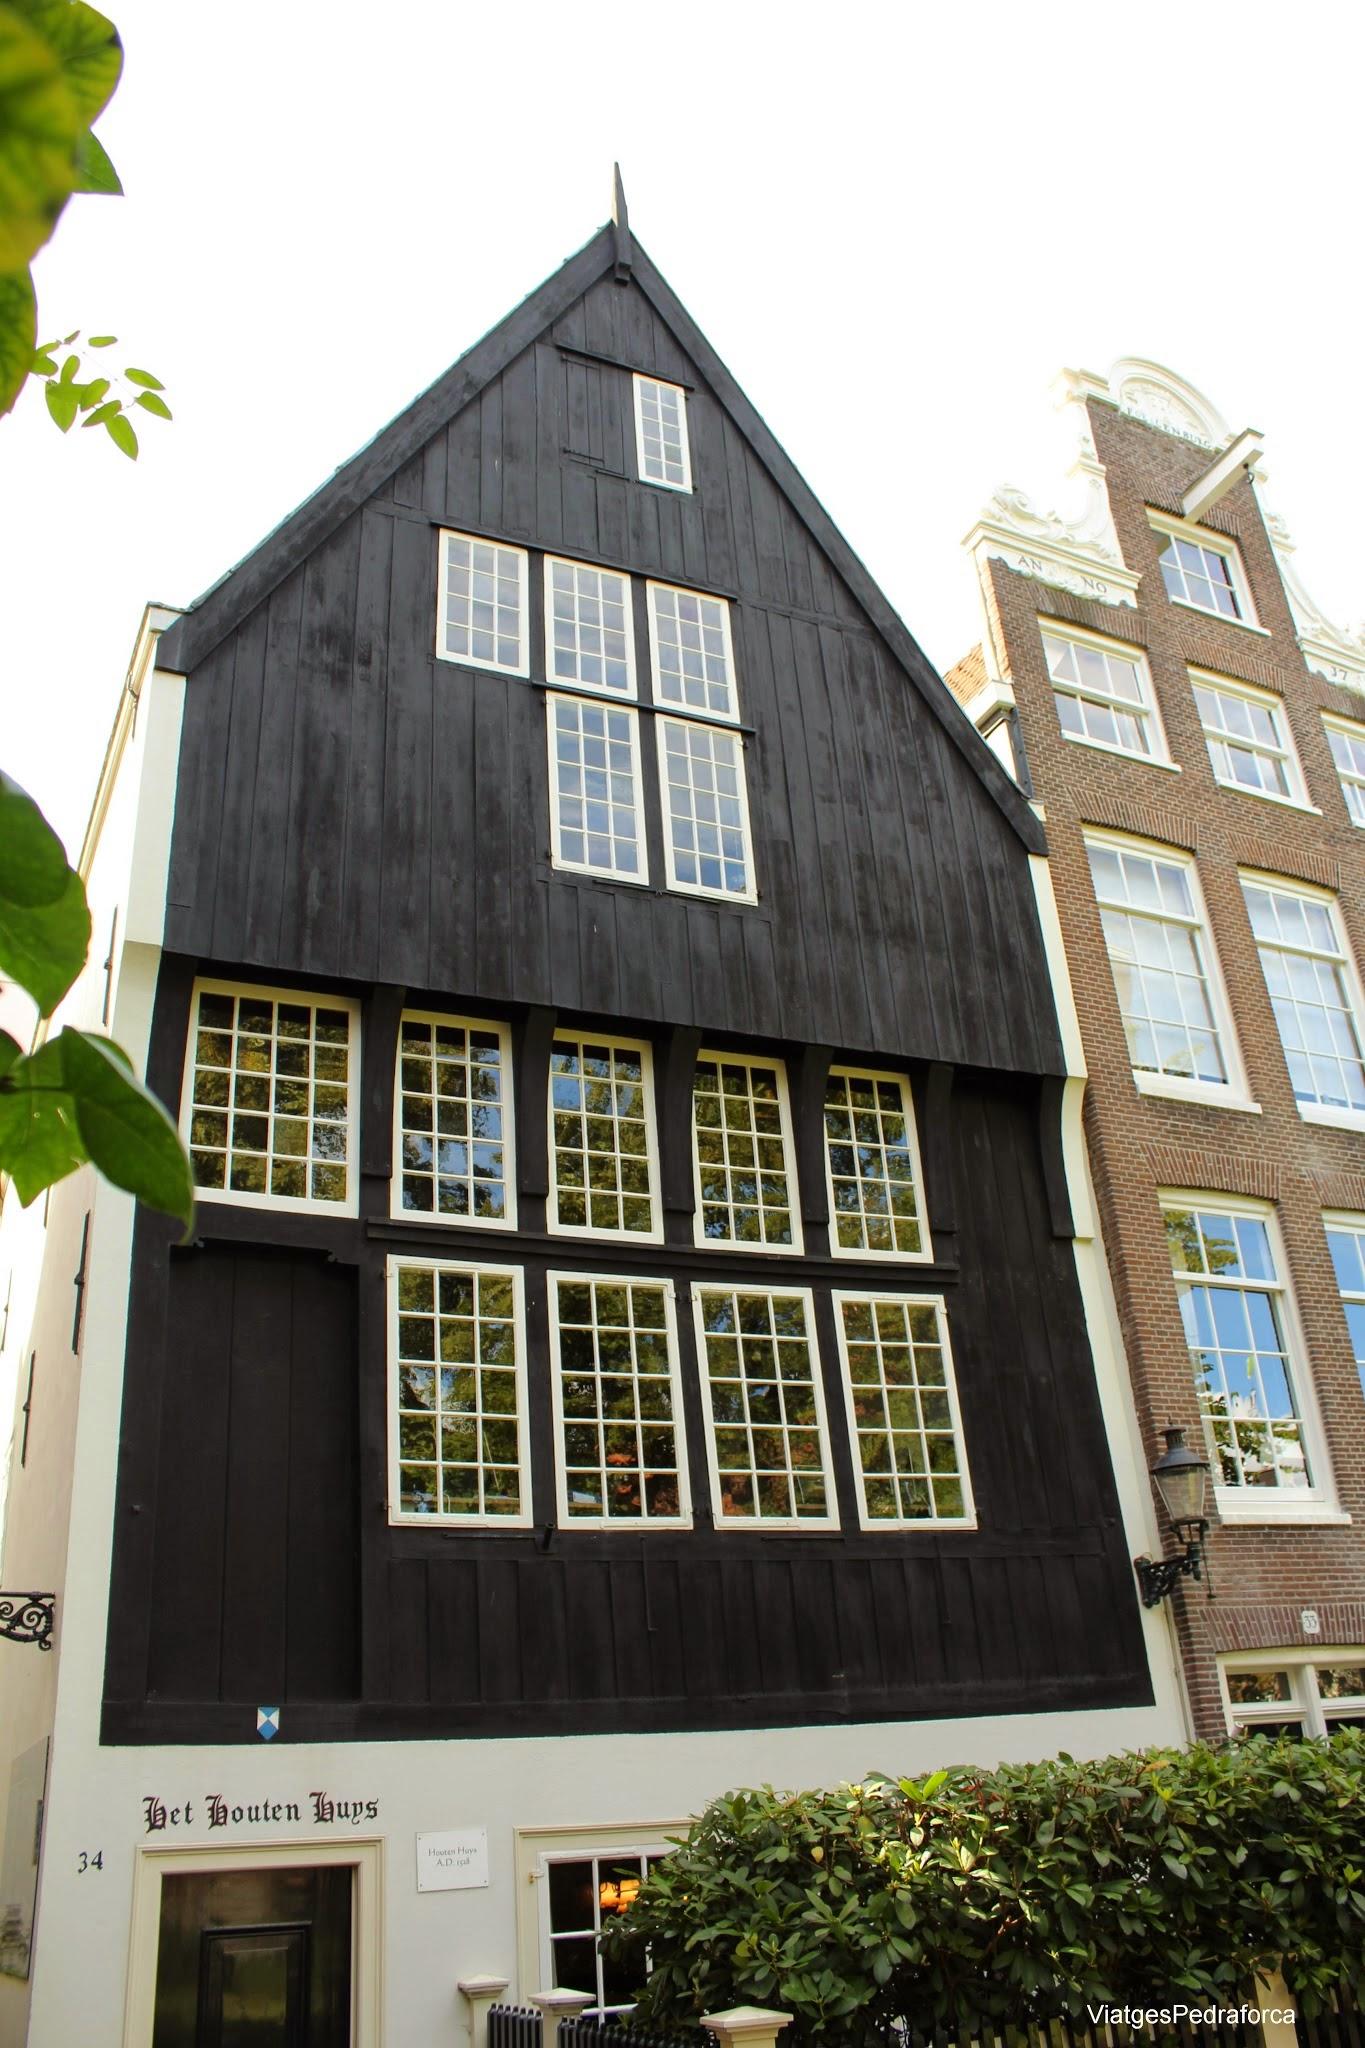 Begijnhof d'Amsterdam casa de fusta S XVI Holanda Països Baixos